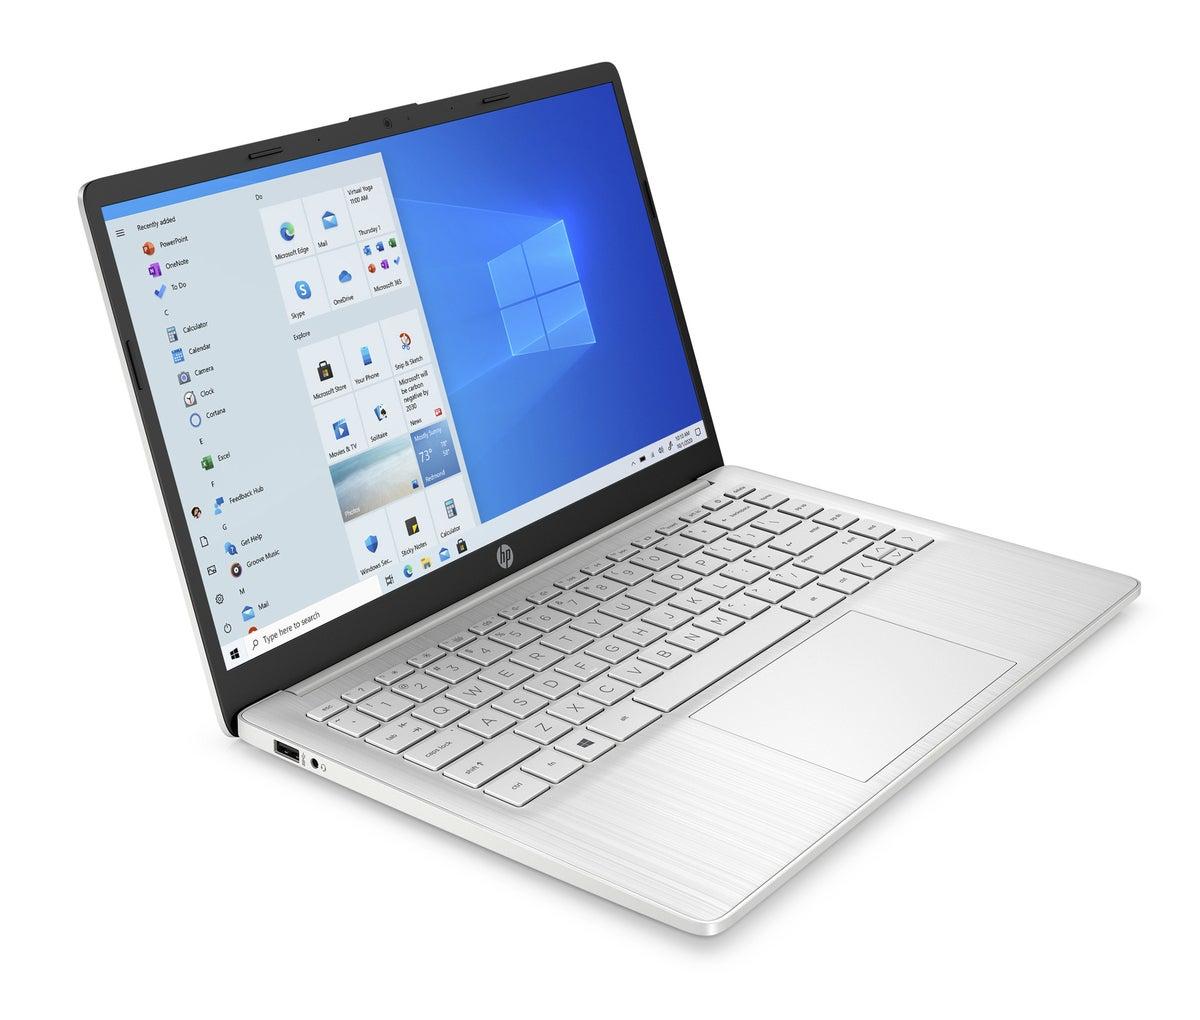 hp 14 inch laptop wlan naturalsilver nt hdcam nonodd nonfpr coreset frontright